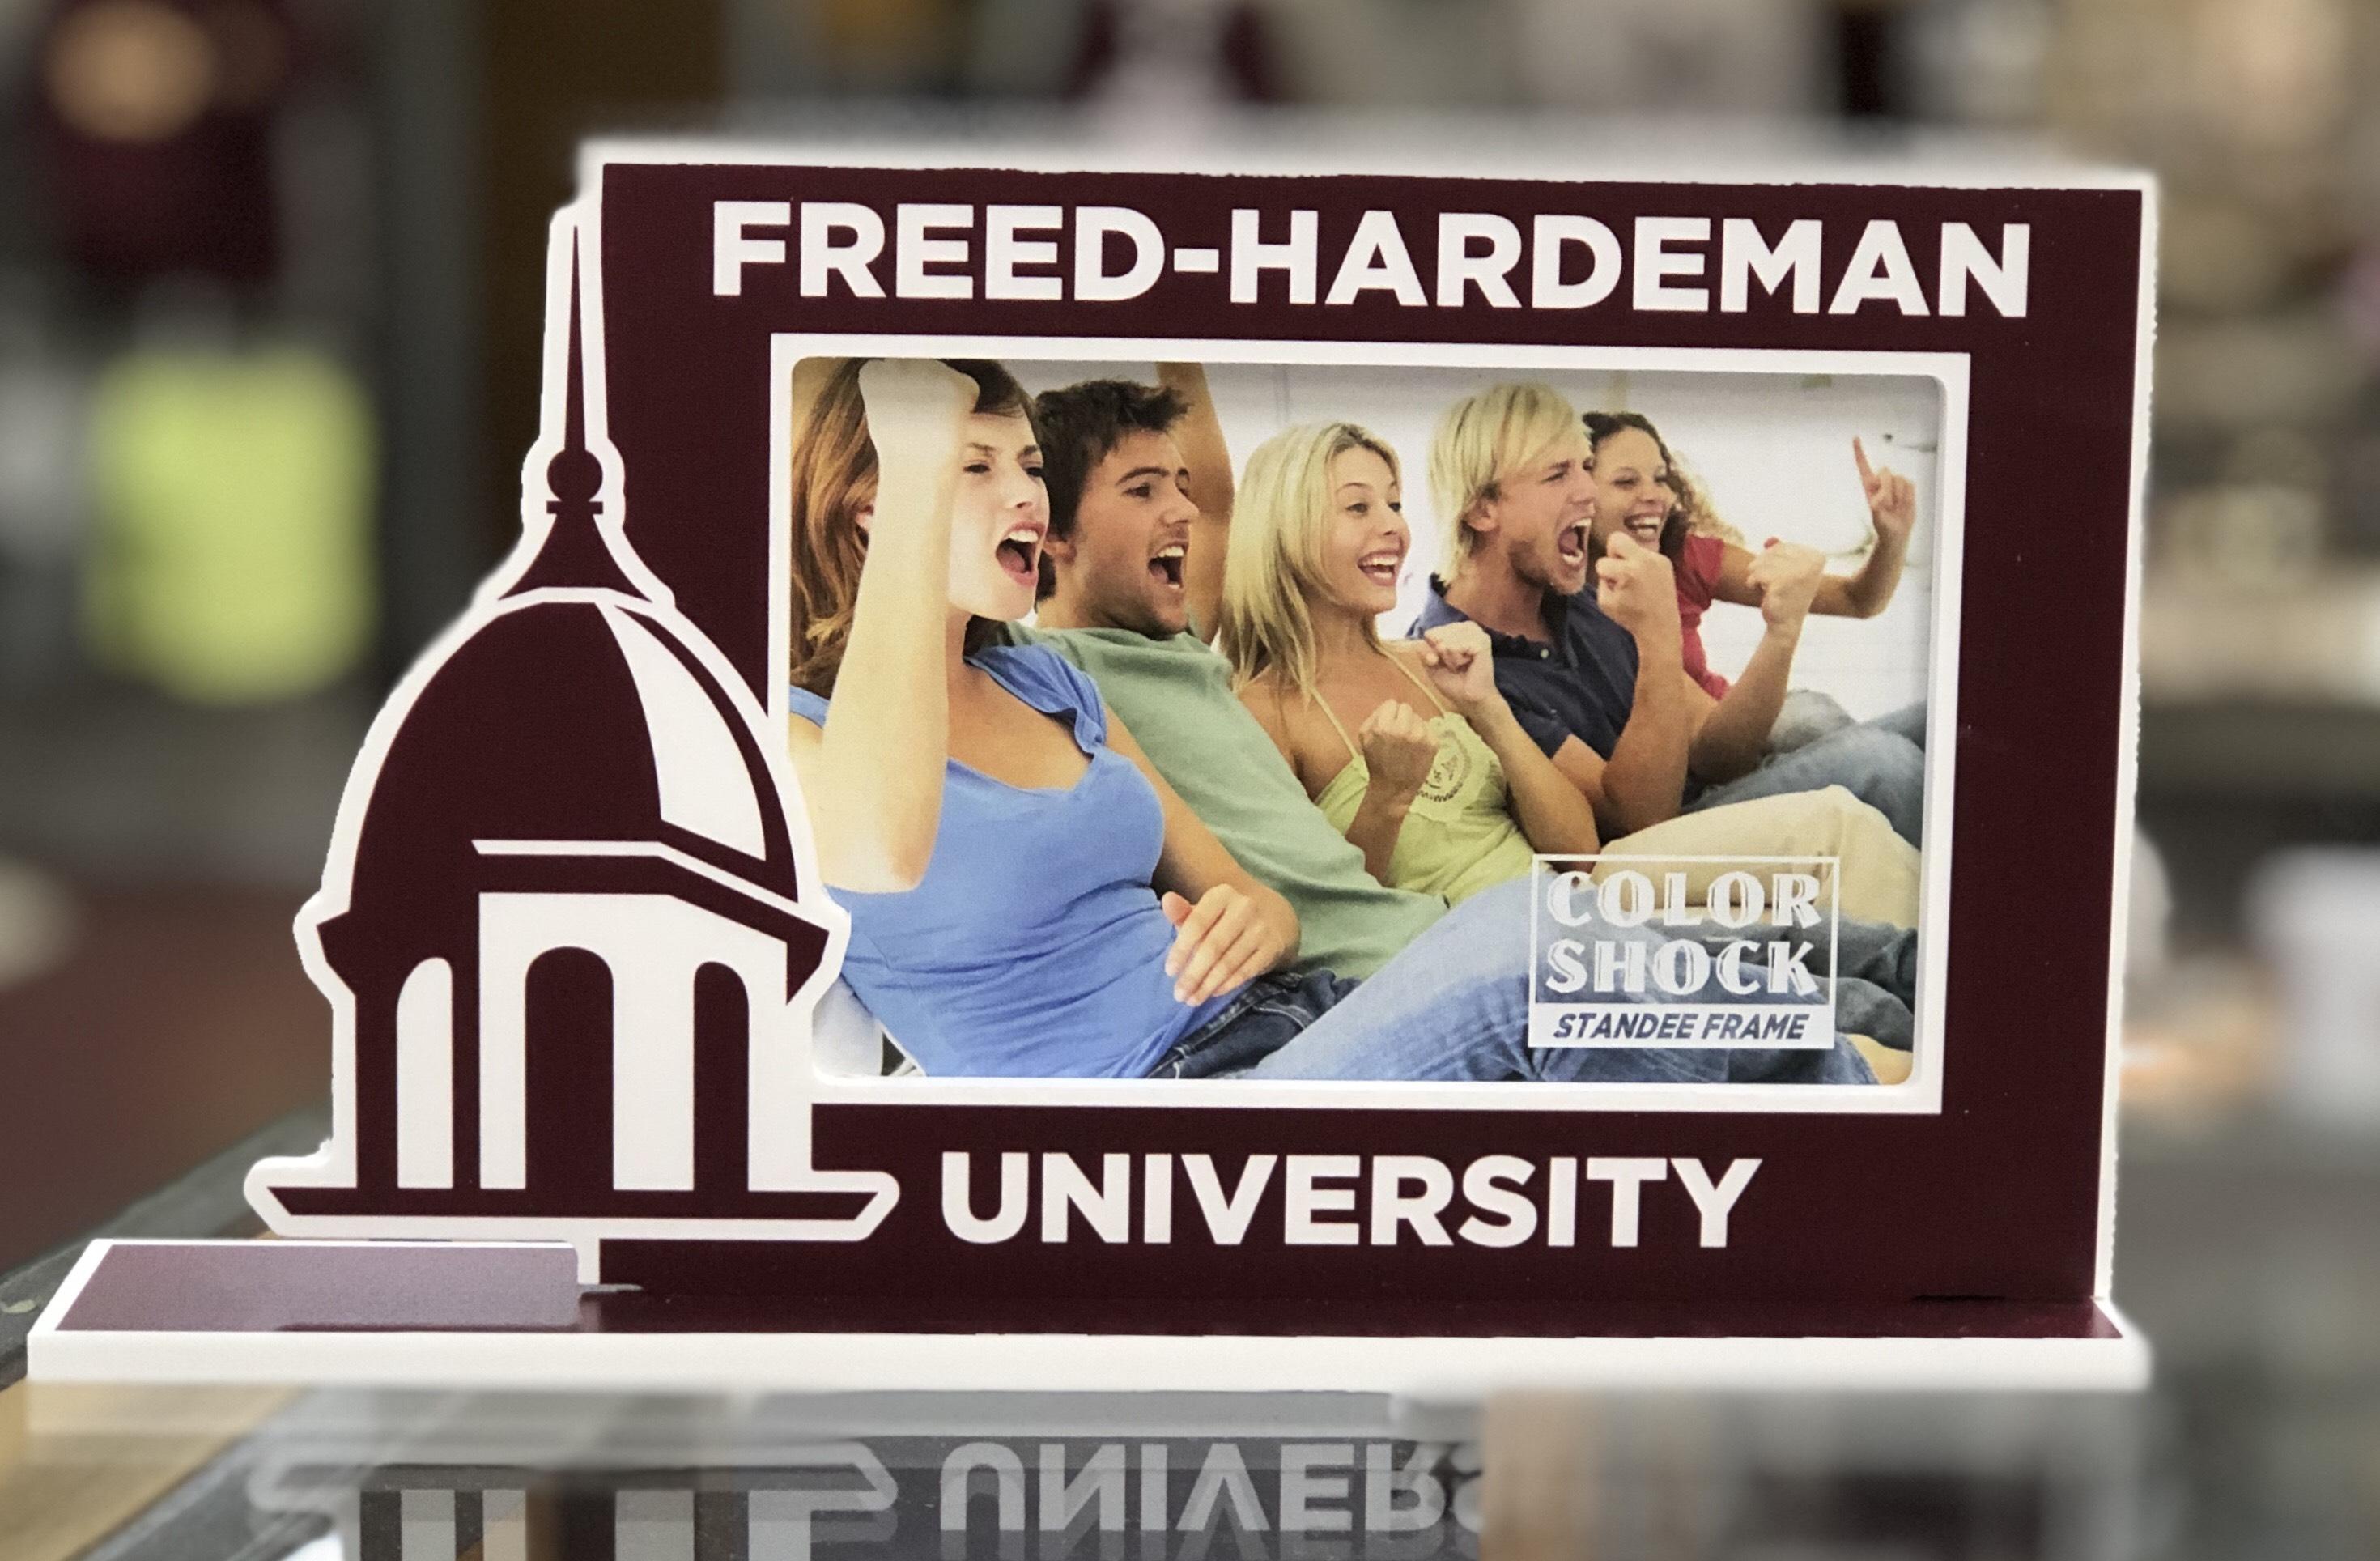 Freed-Hardeman University Standee